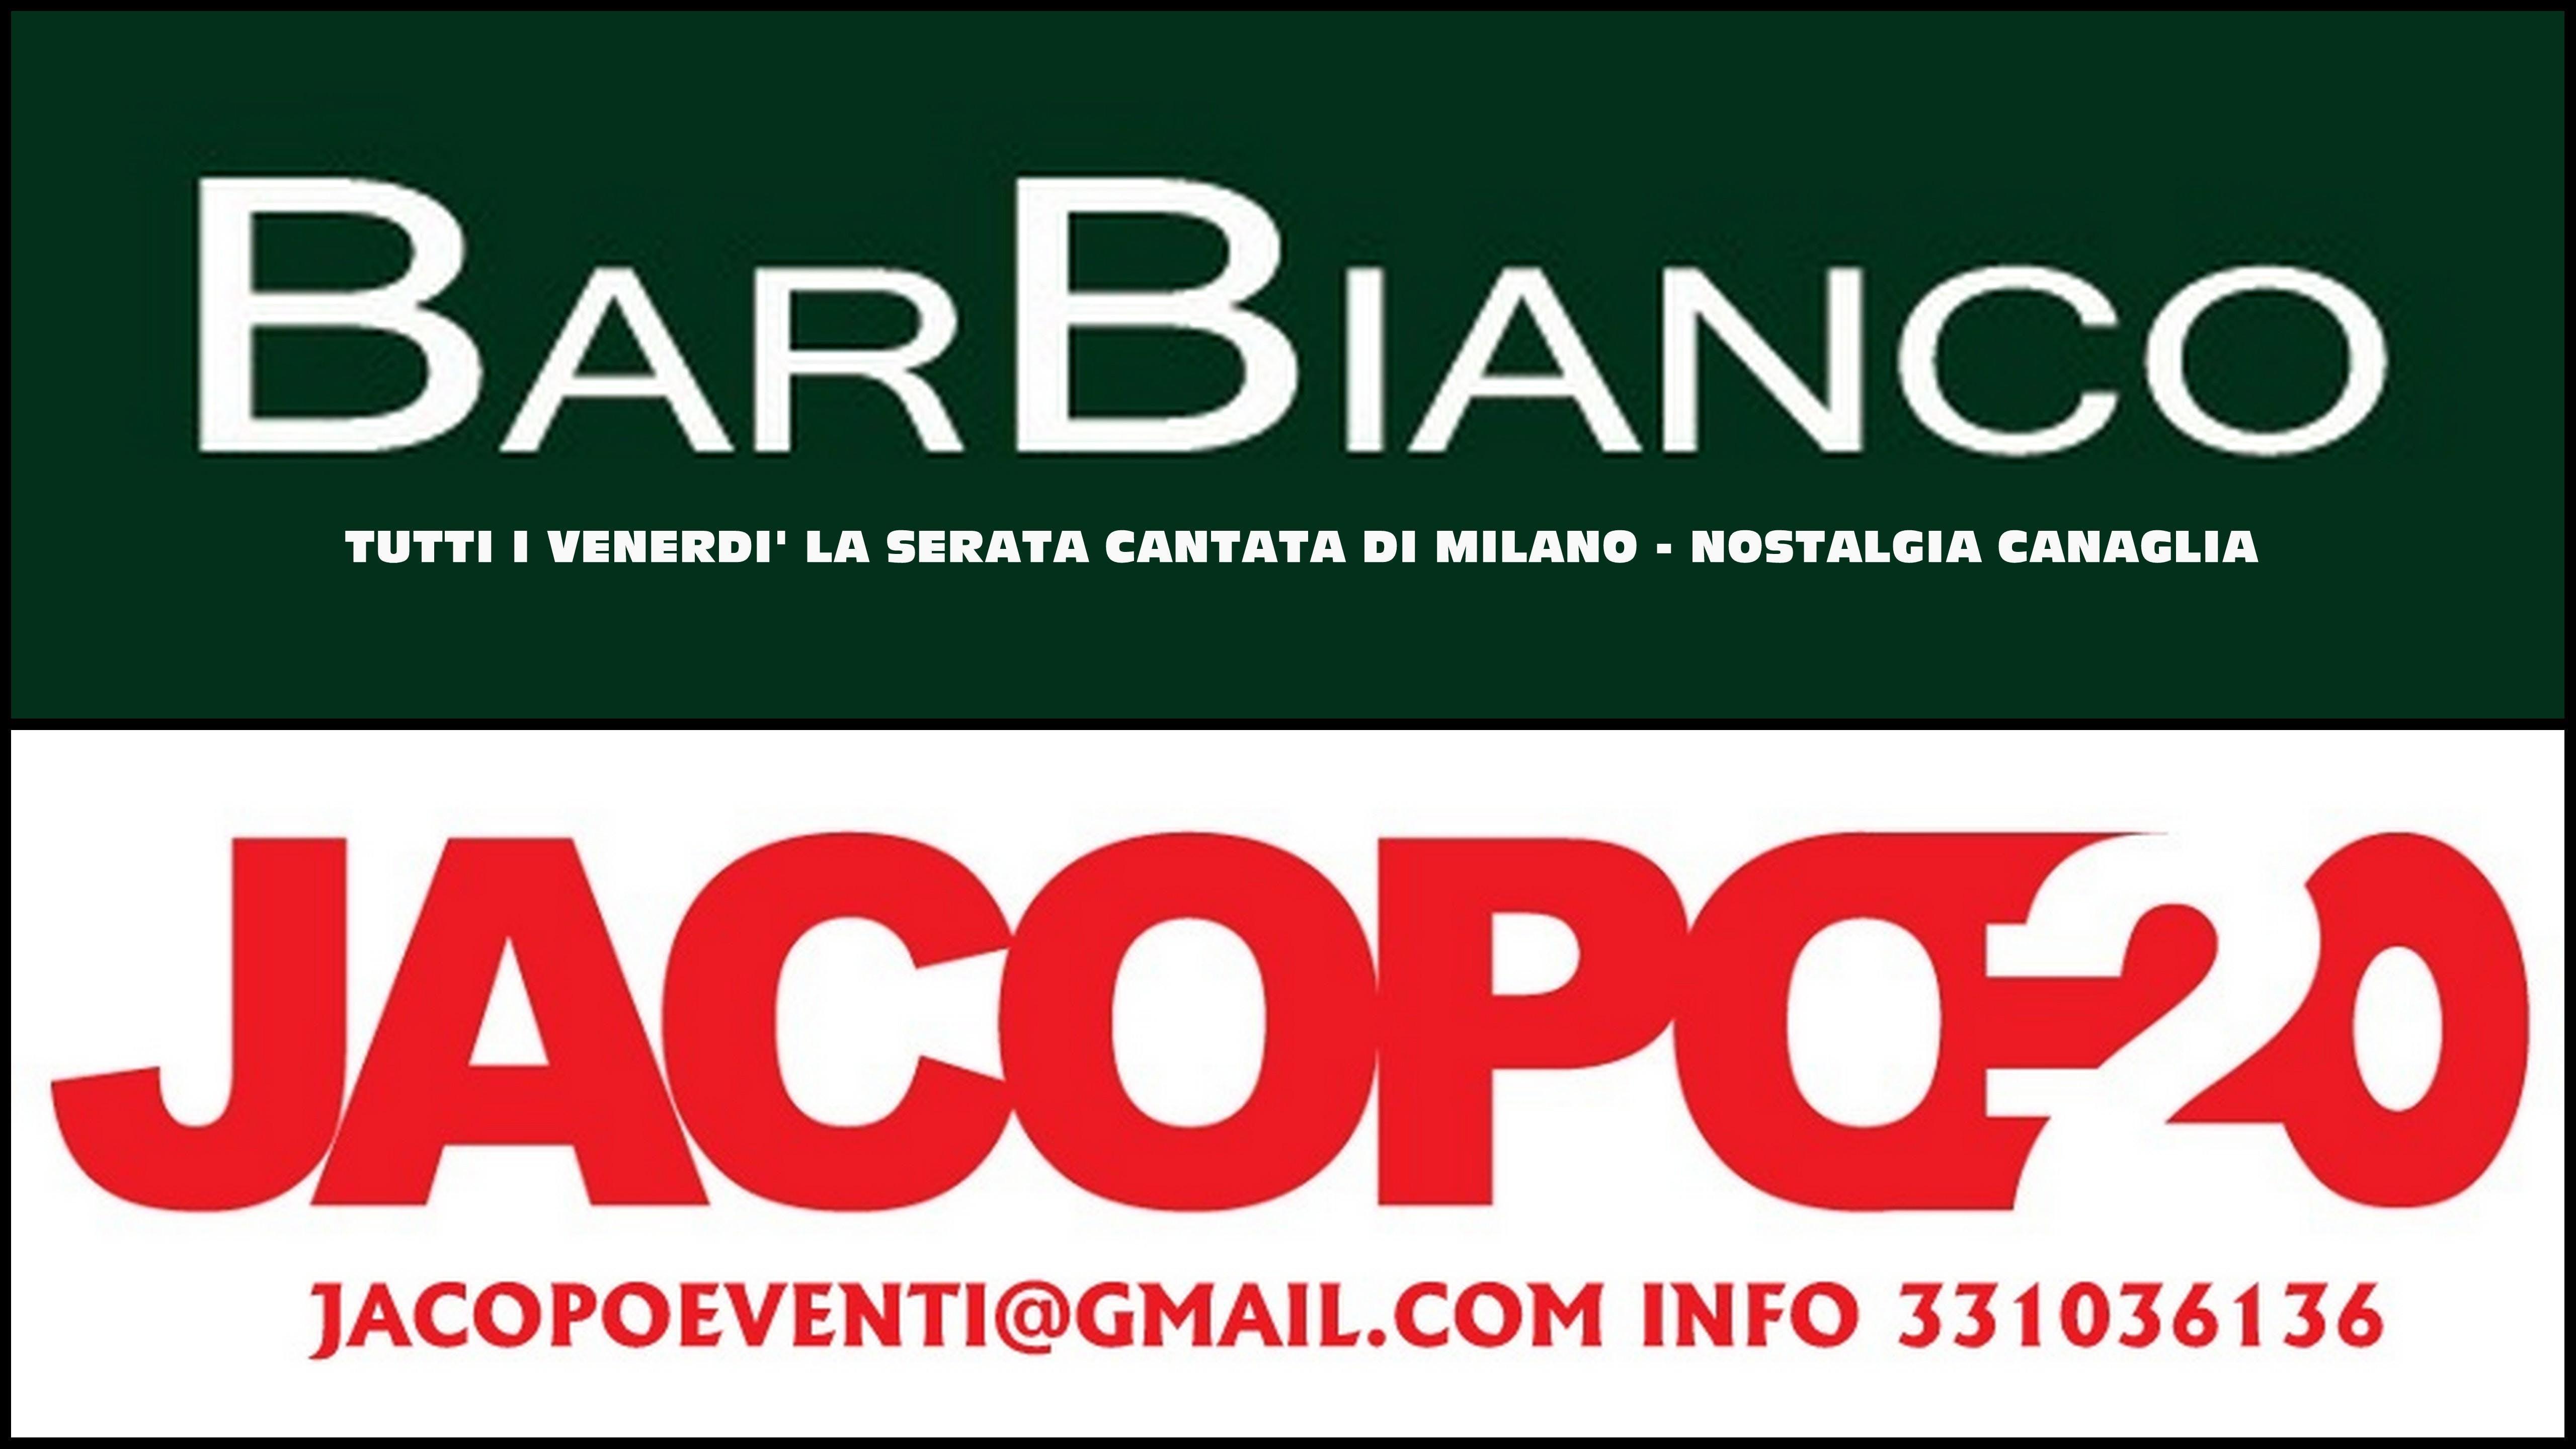 Tutti i Venerdi notte - Bar Bianco - Nostalgia Canaglia -lista Jacopo 3313036136